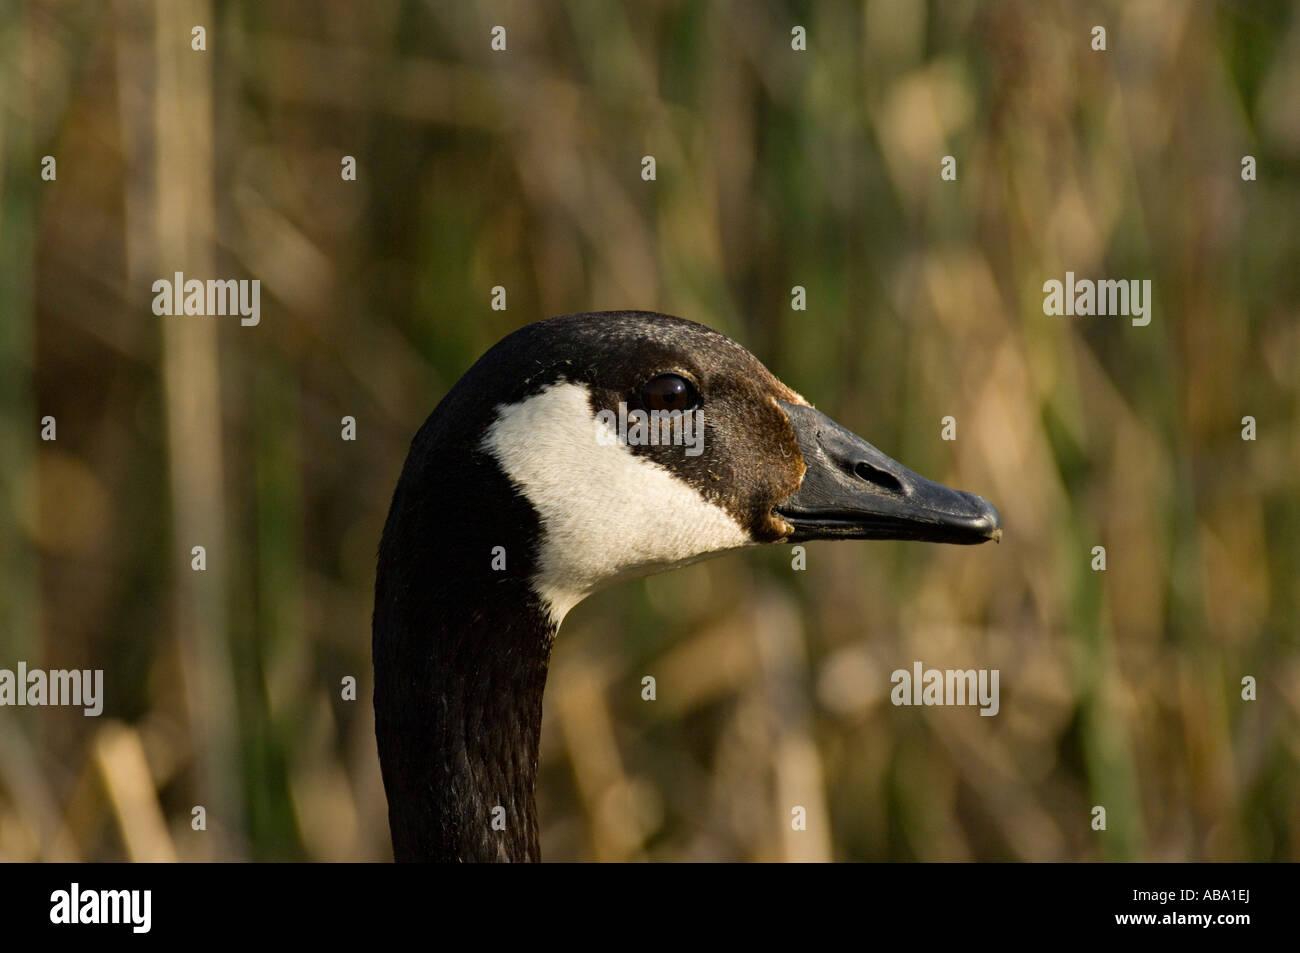 An adult canada goose close up portrait stock photo royalty free an adult canada goose close up portrait biocorpaavc